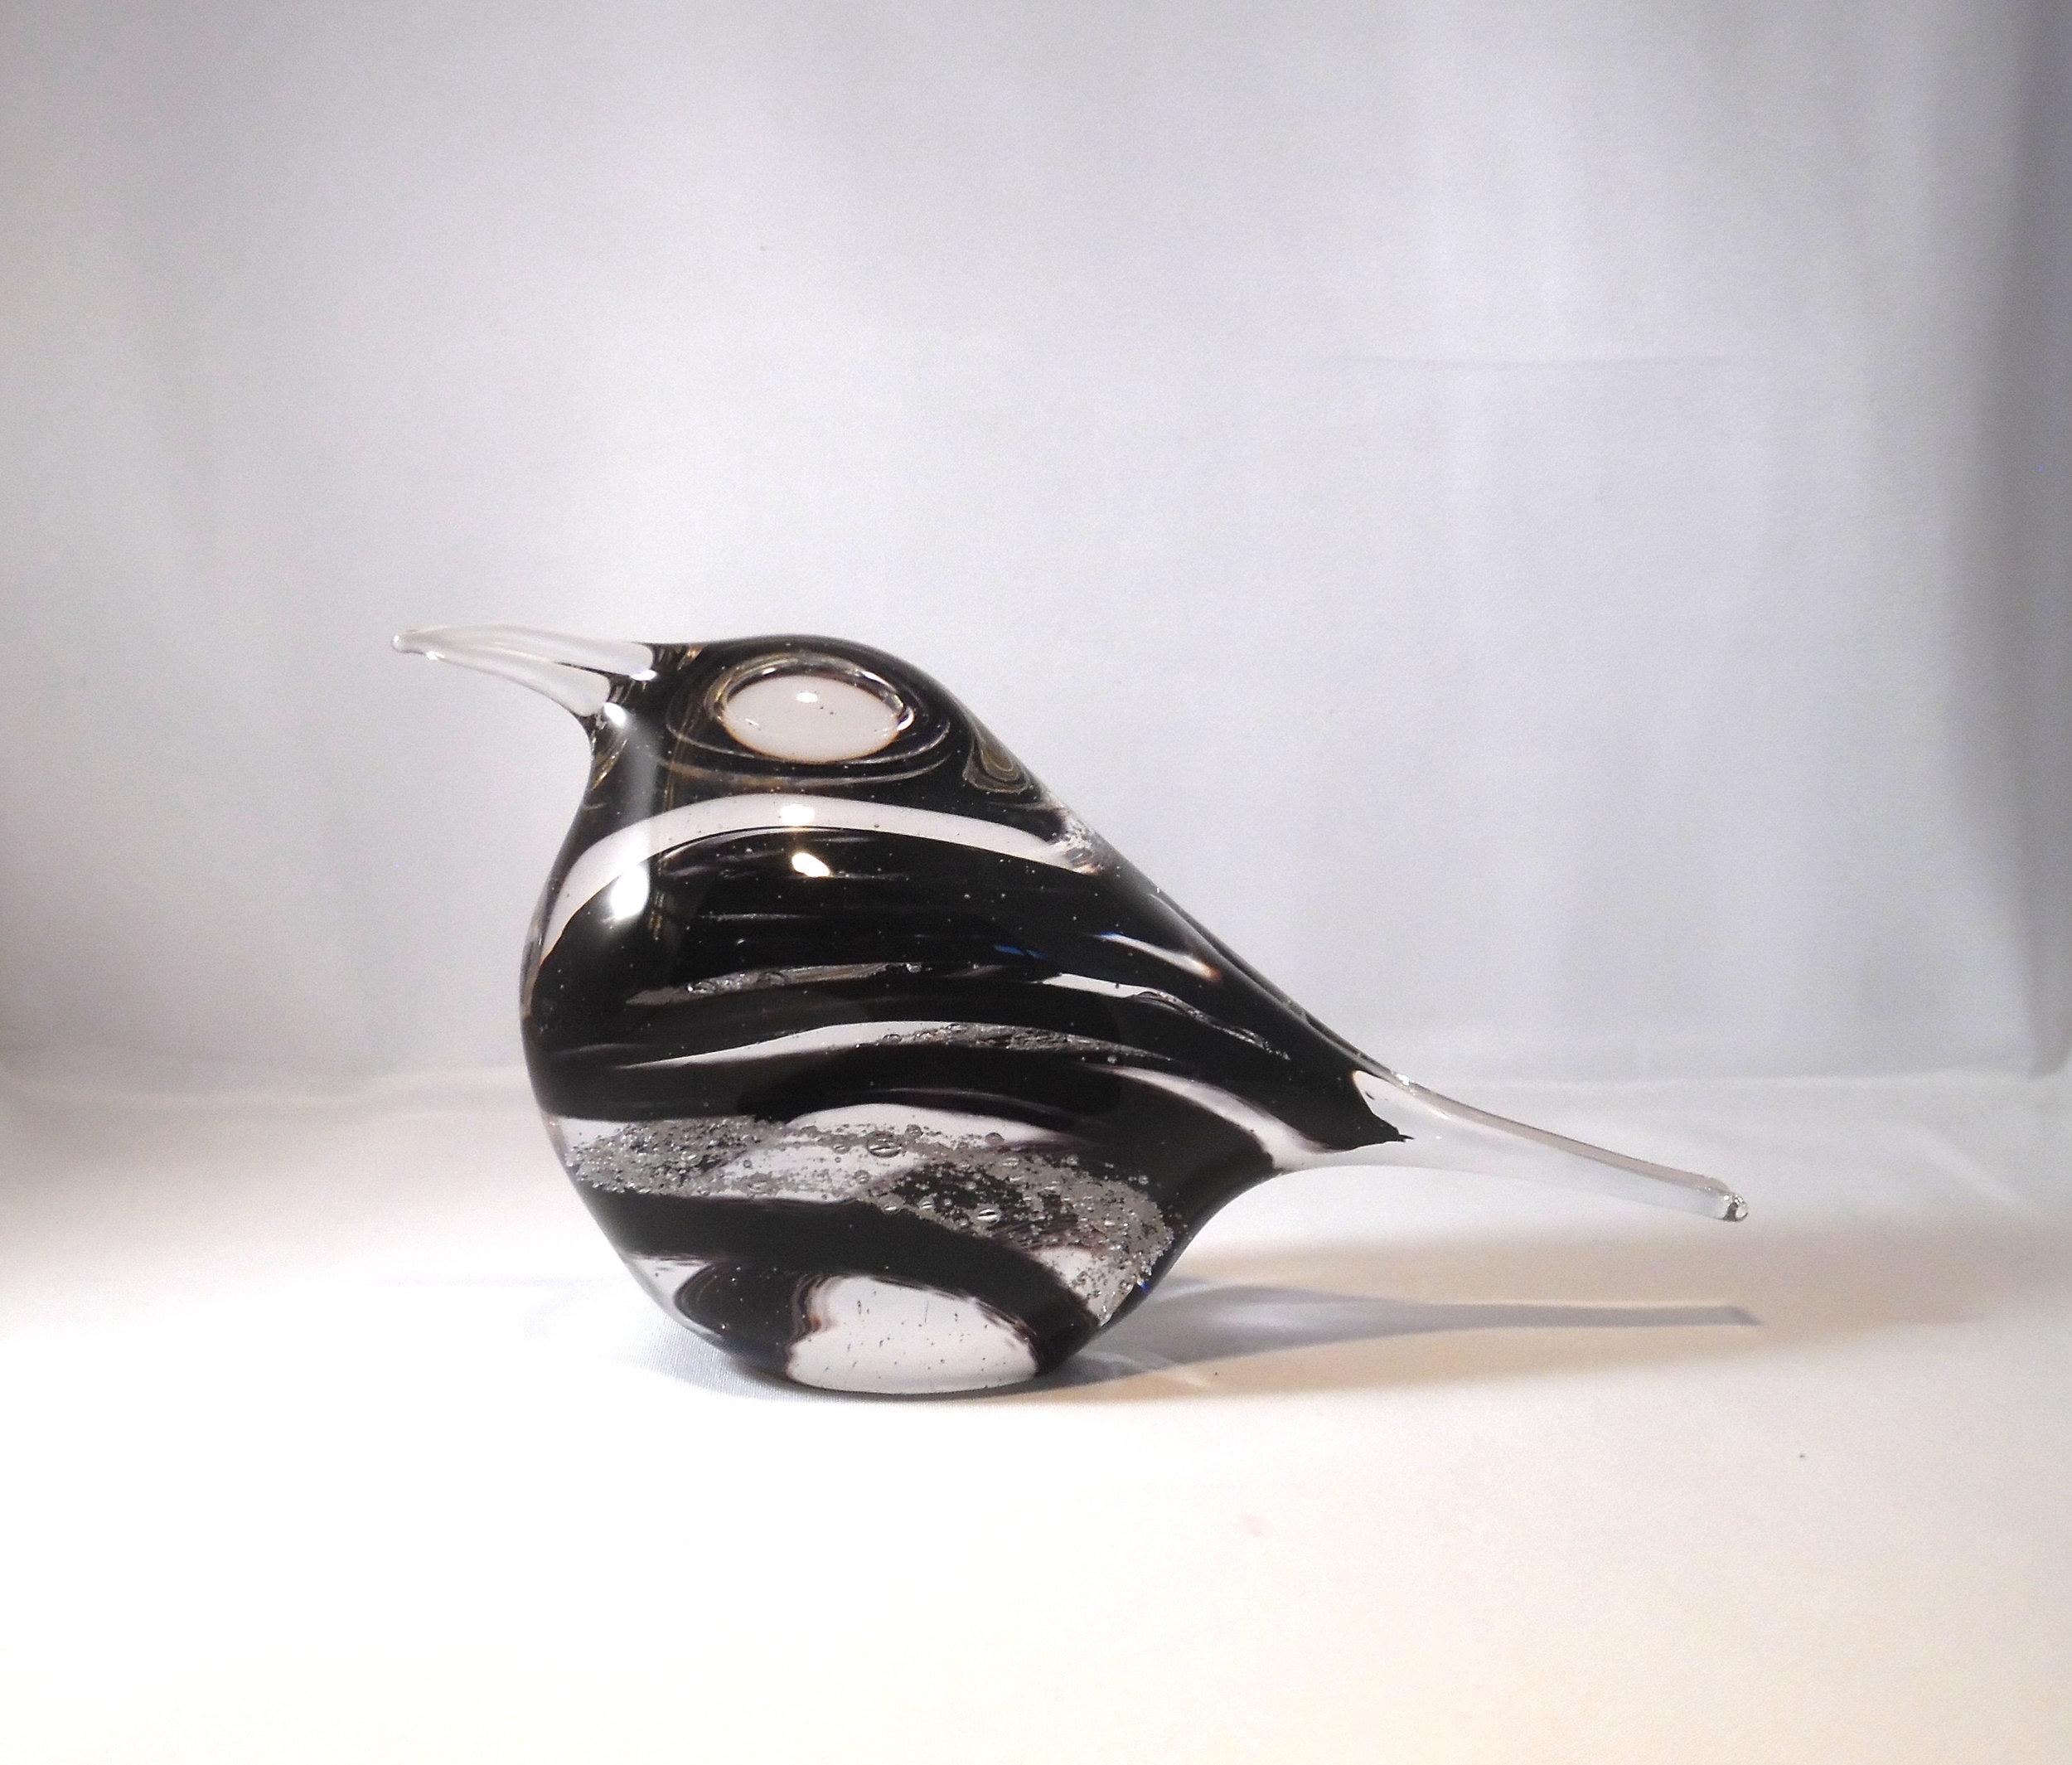 Black Raven by Nicole Tremblay